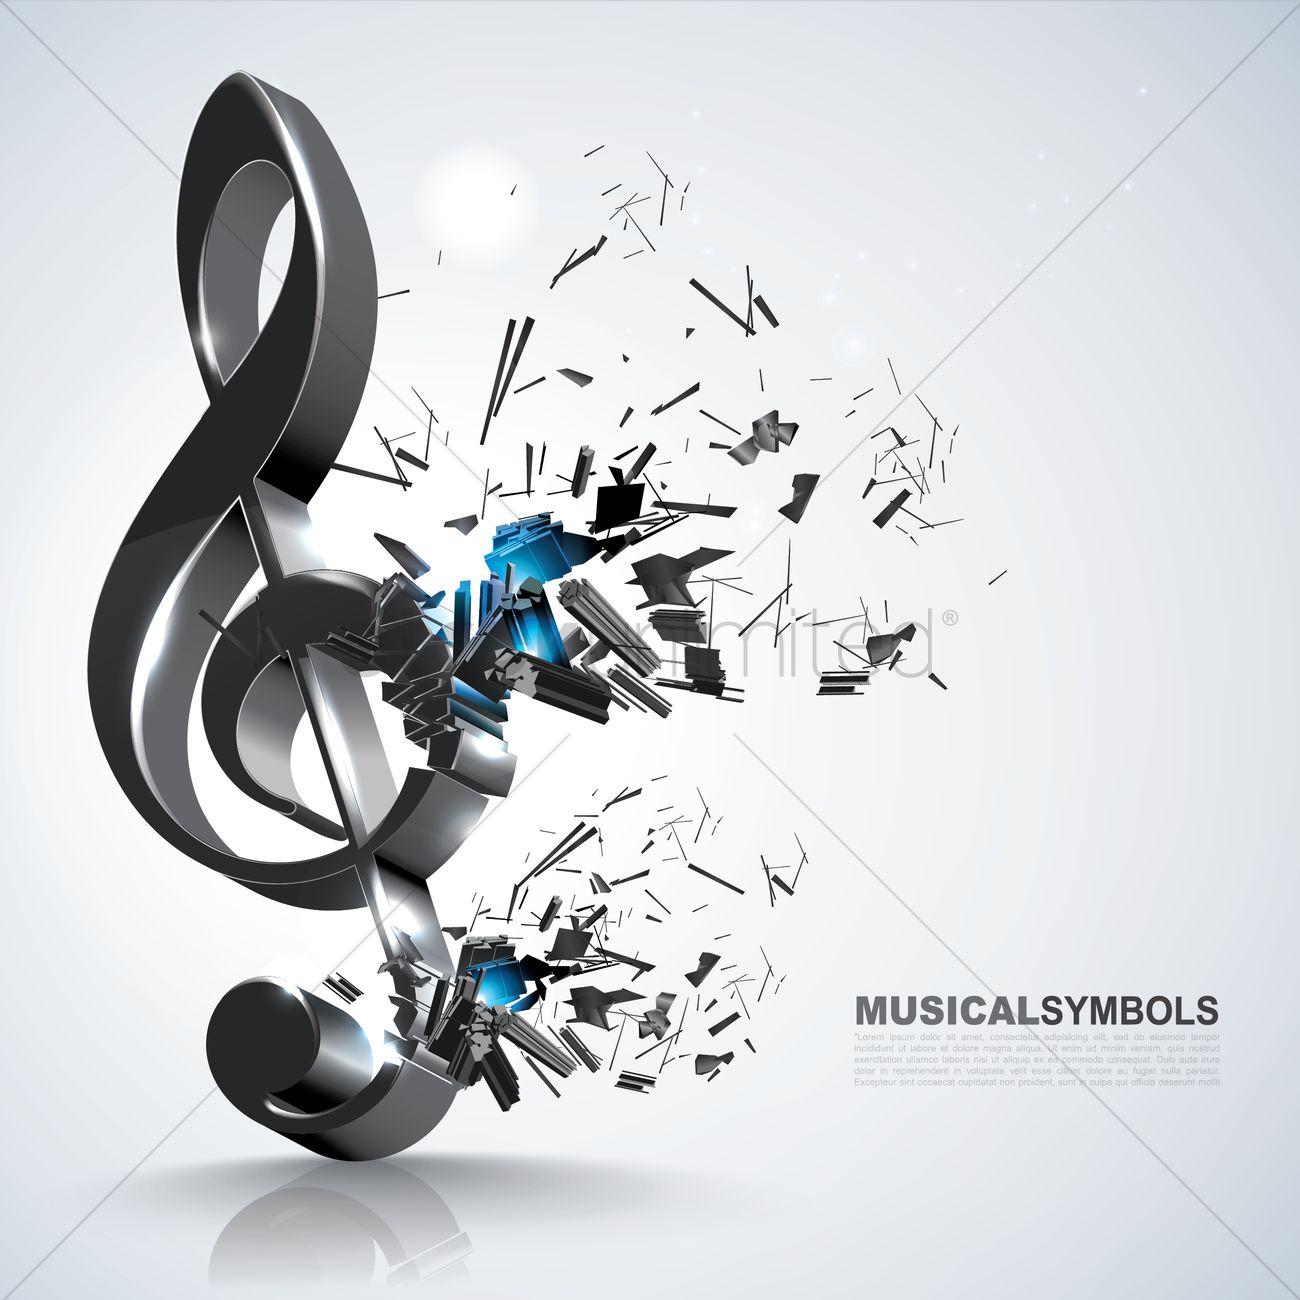 Treble Clef Music Symbol Vector Image 1591729 Stockunlimited